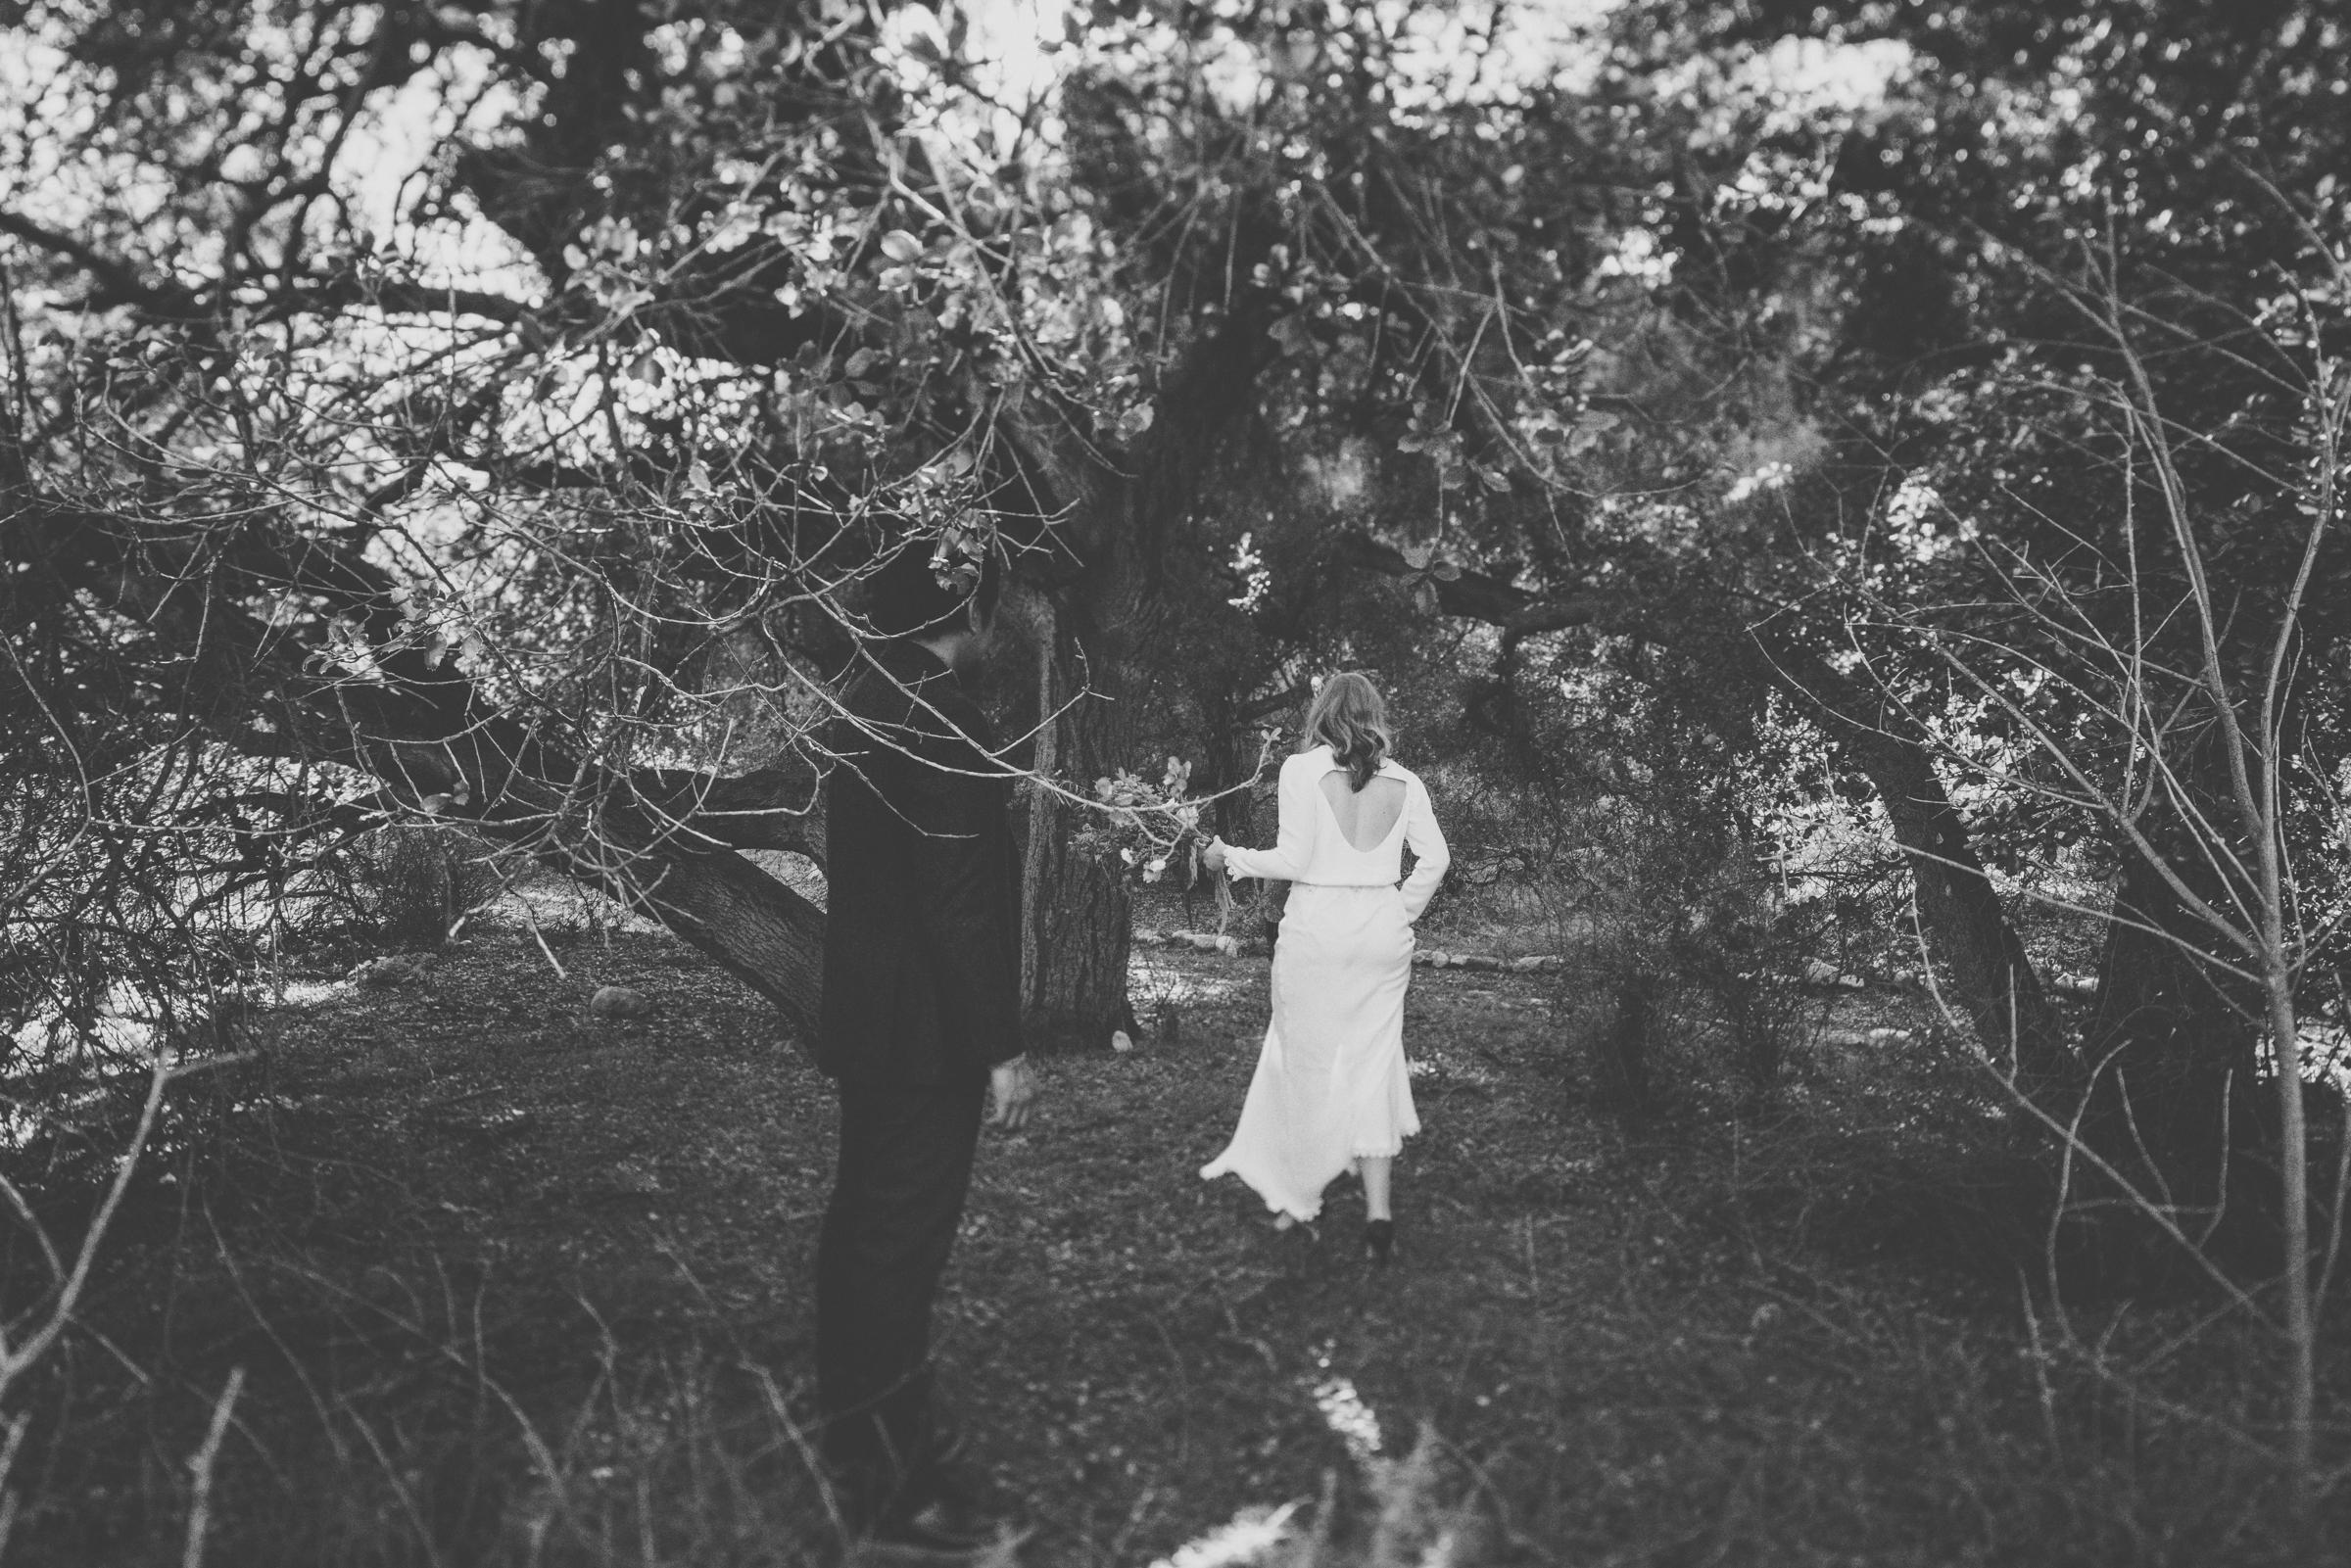 ©Isaiah + Taylor Photography - Intimate Elopement, Eaton Canyon, Los Angeles Wedding Photographer-26.jpg